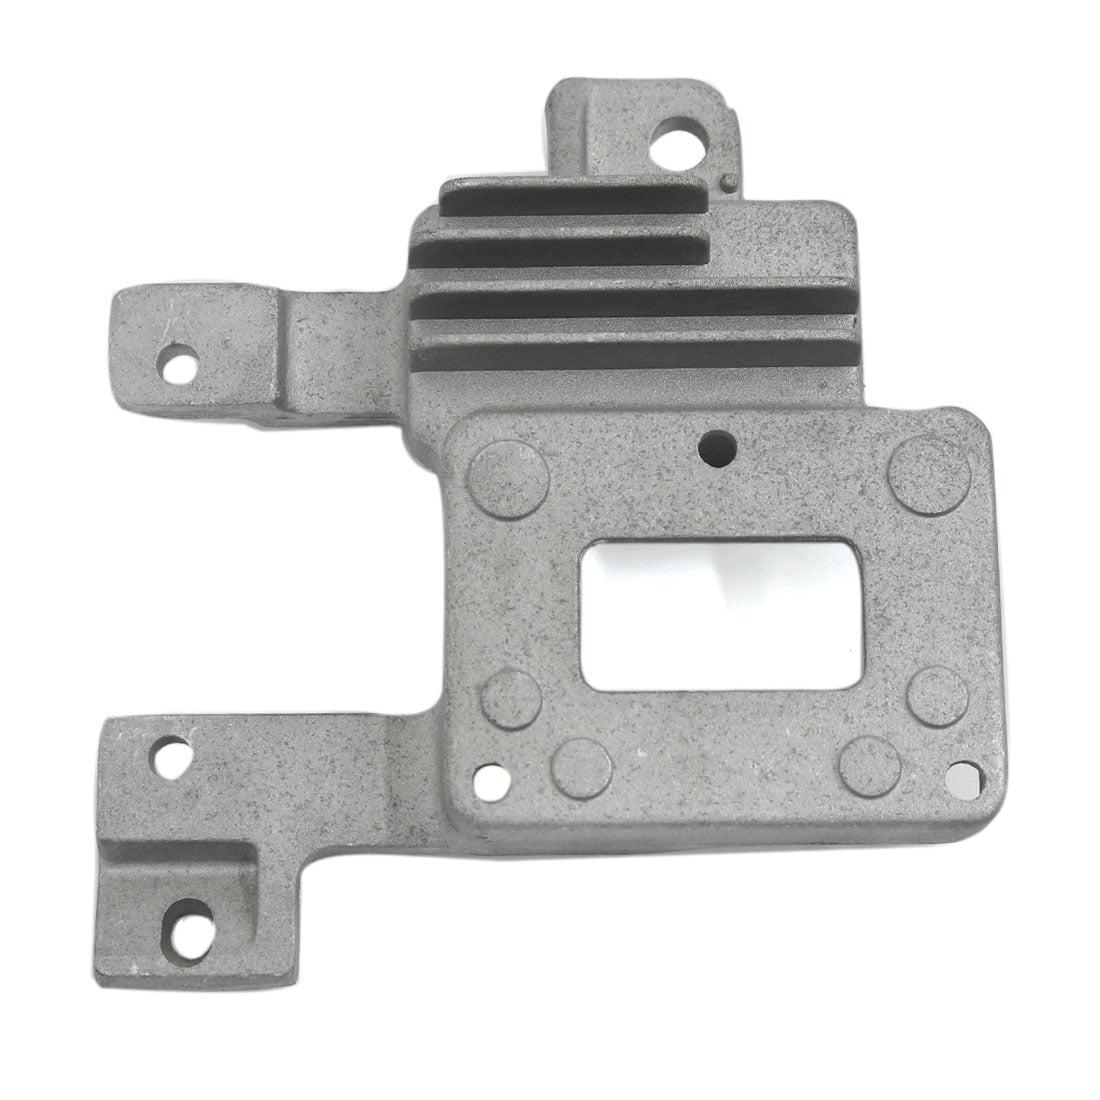 4 Pin Motorcycle Voltage Wiring Regulator Rectifier For Honda Wave 125 Tool